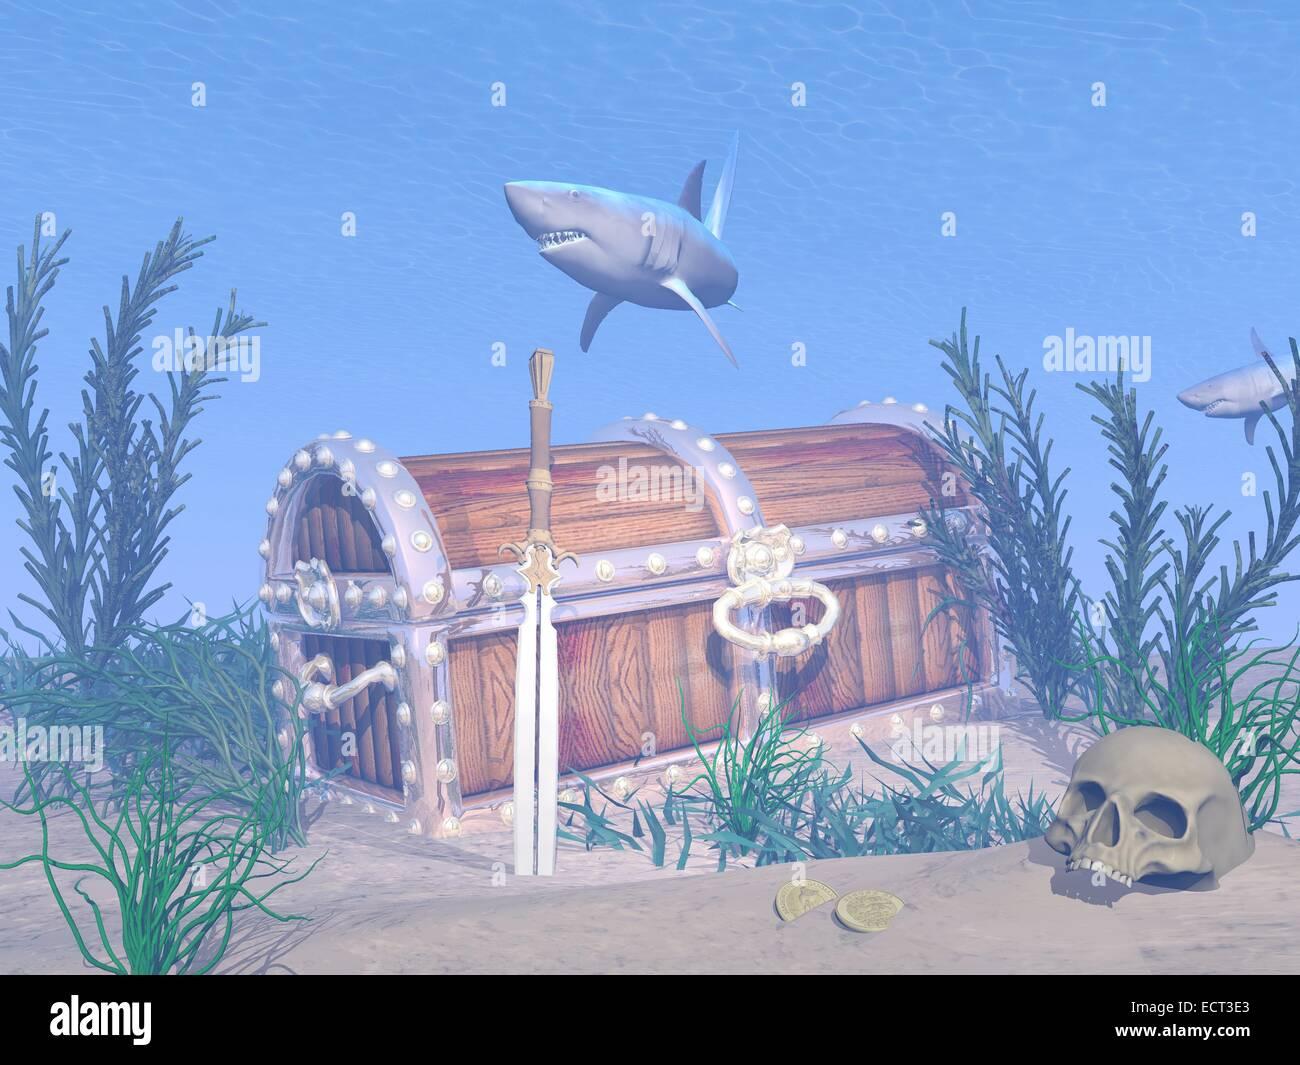 fantasy underwater scenery with lost treasure chest sword skull